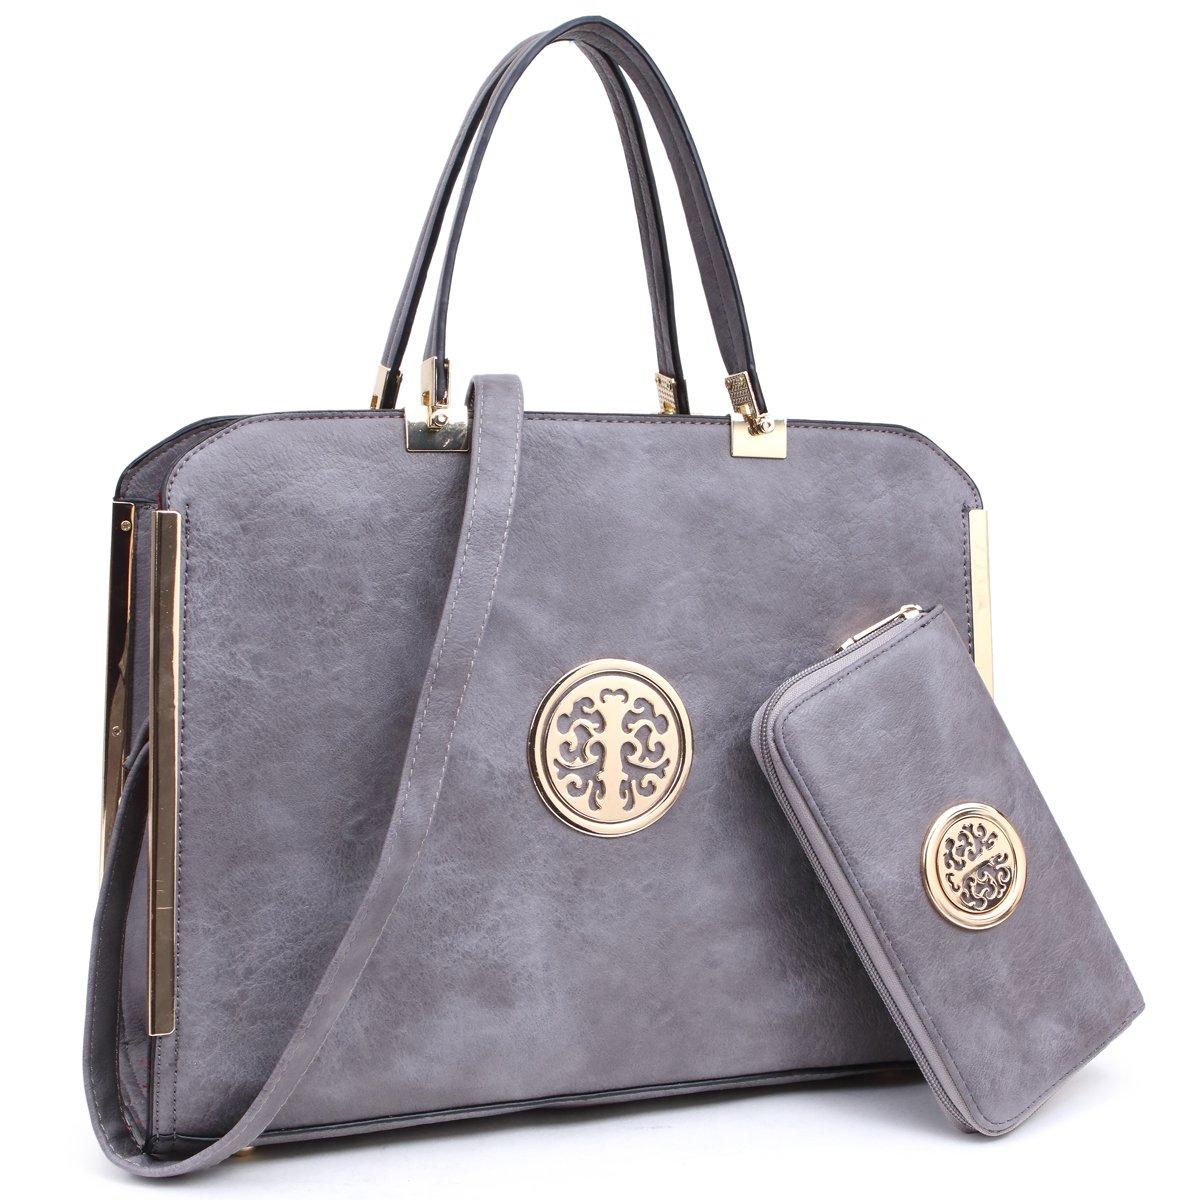 MKY Large Satchel Handbag Designer Purse Multicolor Grey w/ Matching Wallet Shoulder Strap